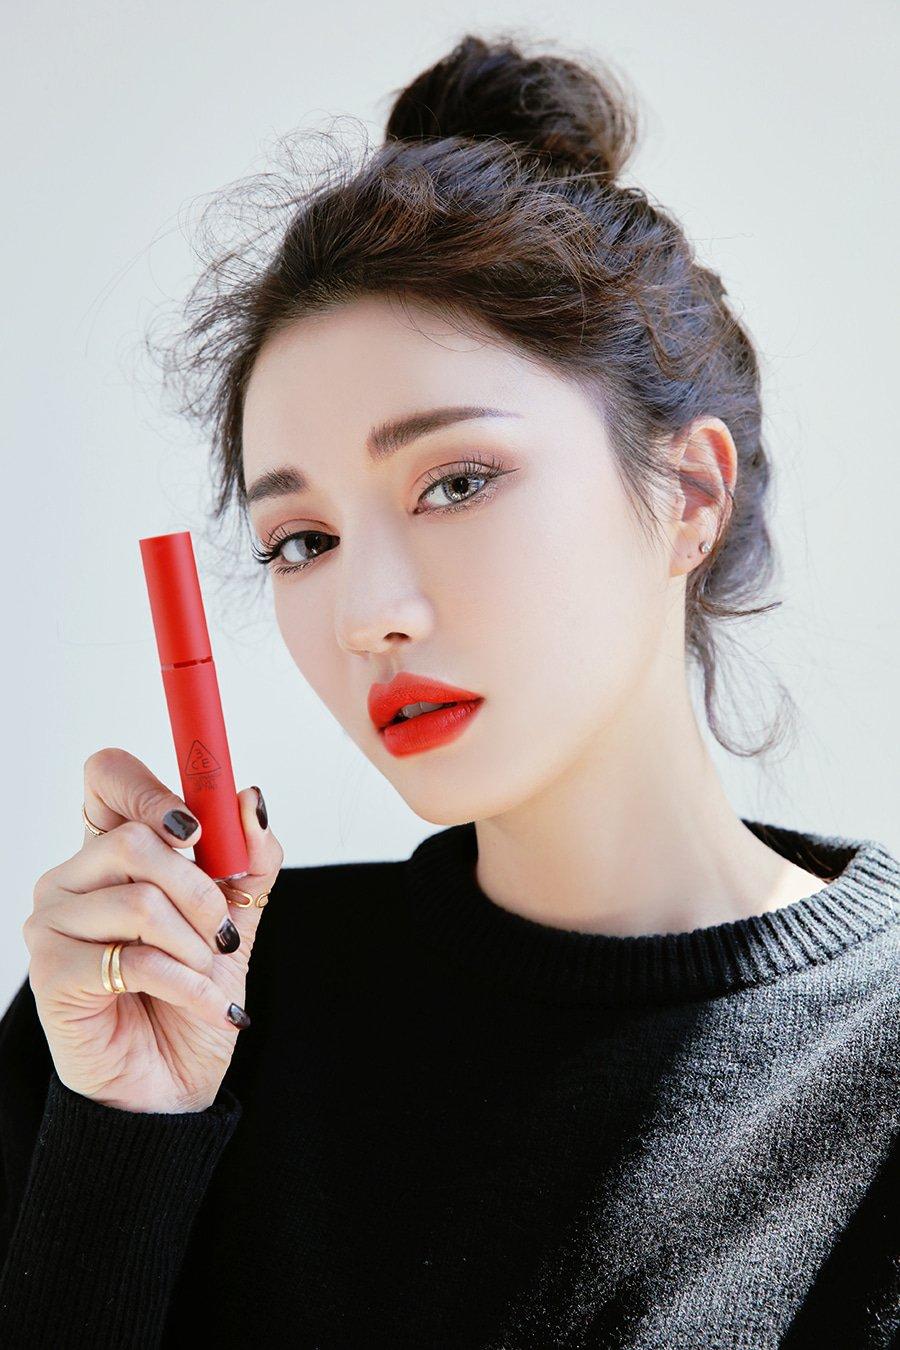 Son kem lì 3CE Velvet Lip Tint sắc đỏ cam tươi tắn